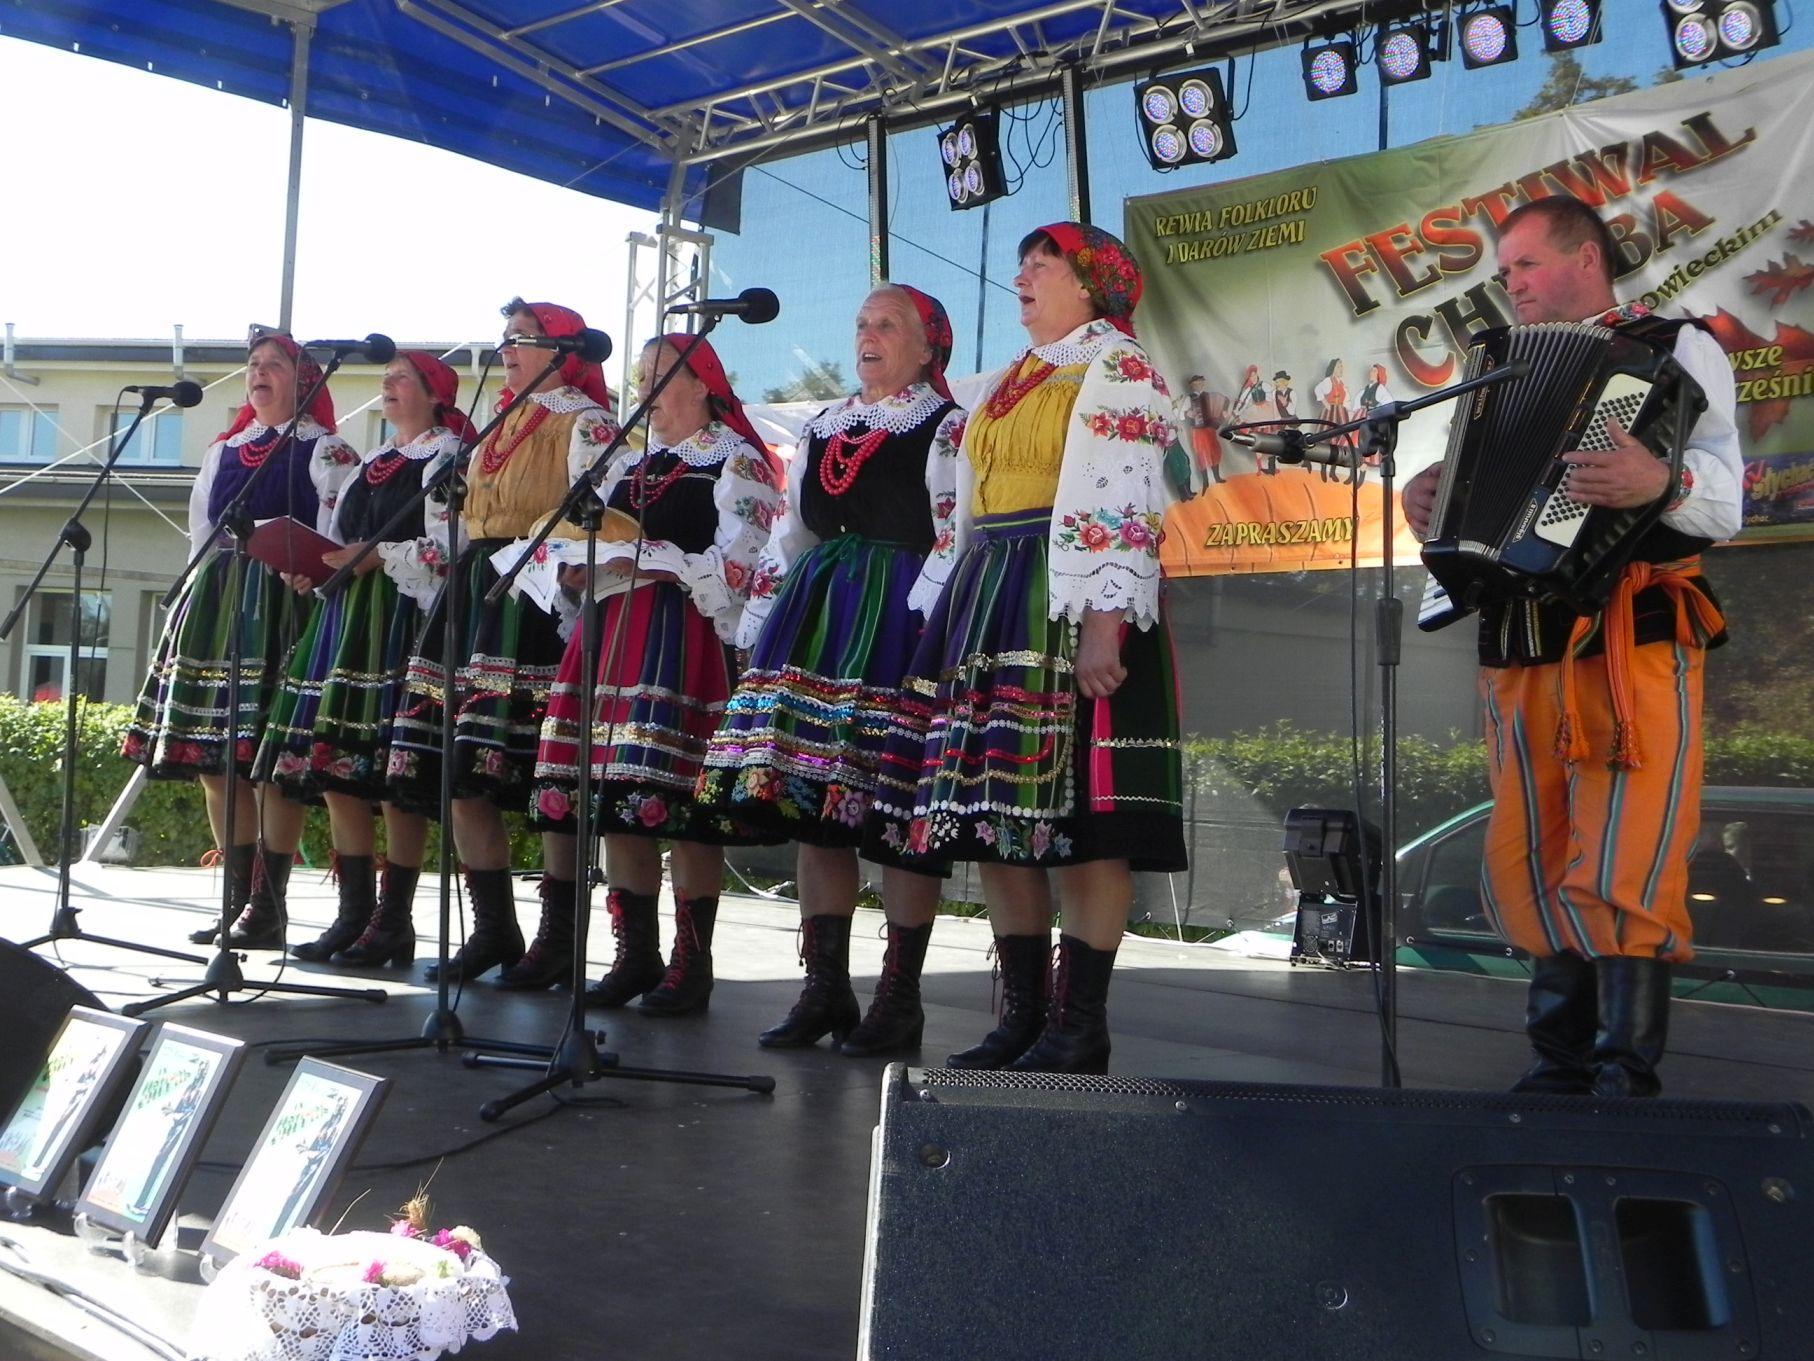 2013-09-10 Festyn - Mińsk Maz (45)